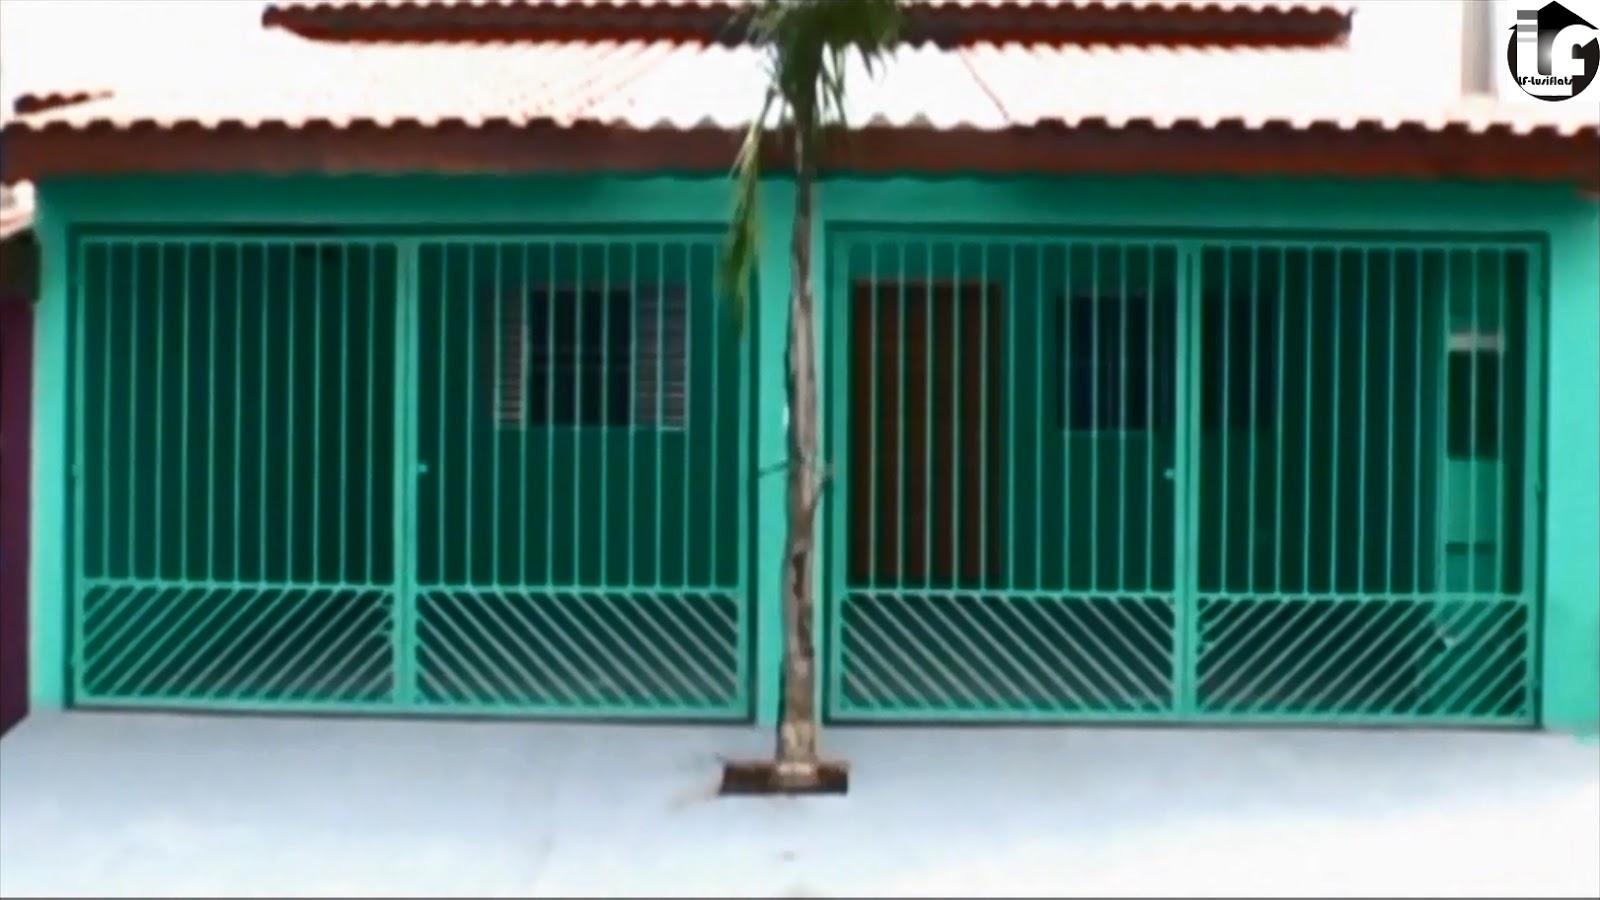 fachada verde portões metal garagem 2 vagas #125C4D 1600 900